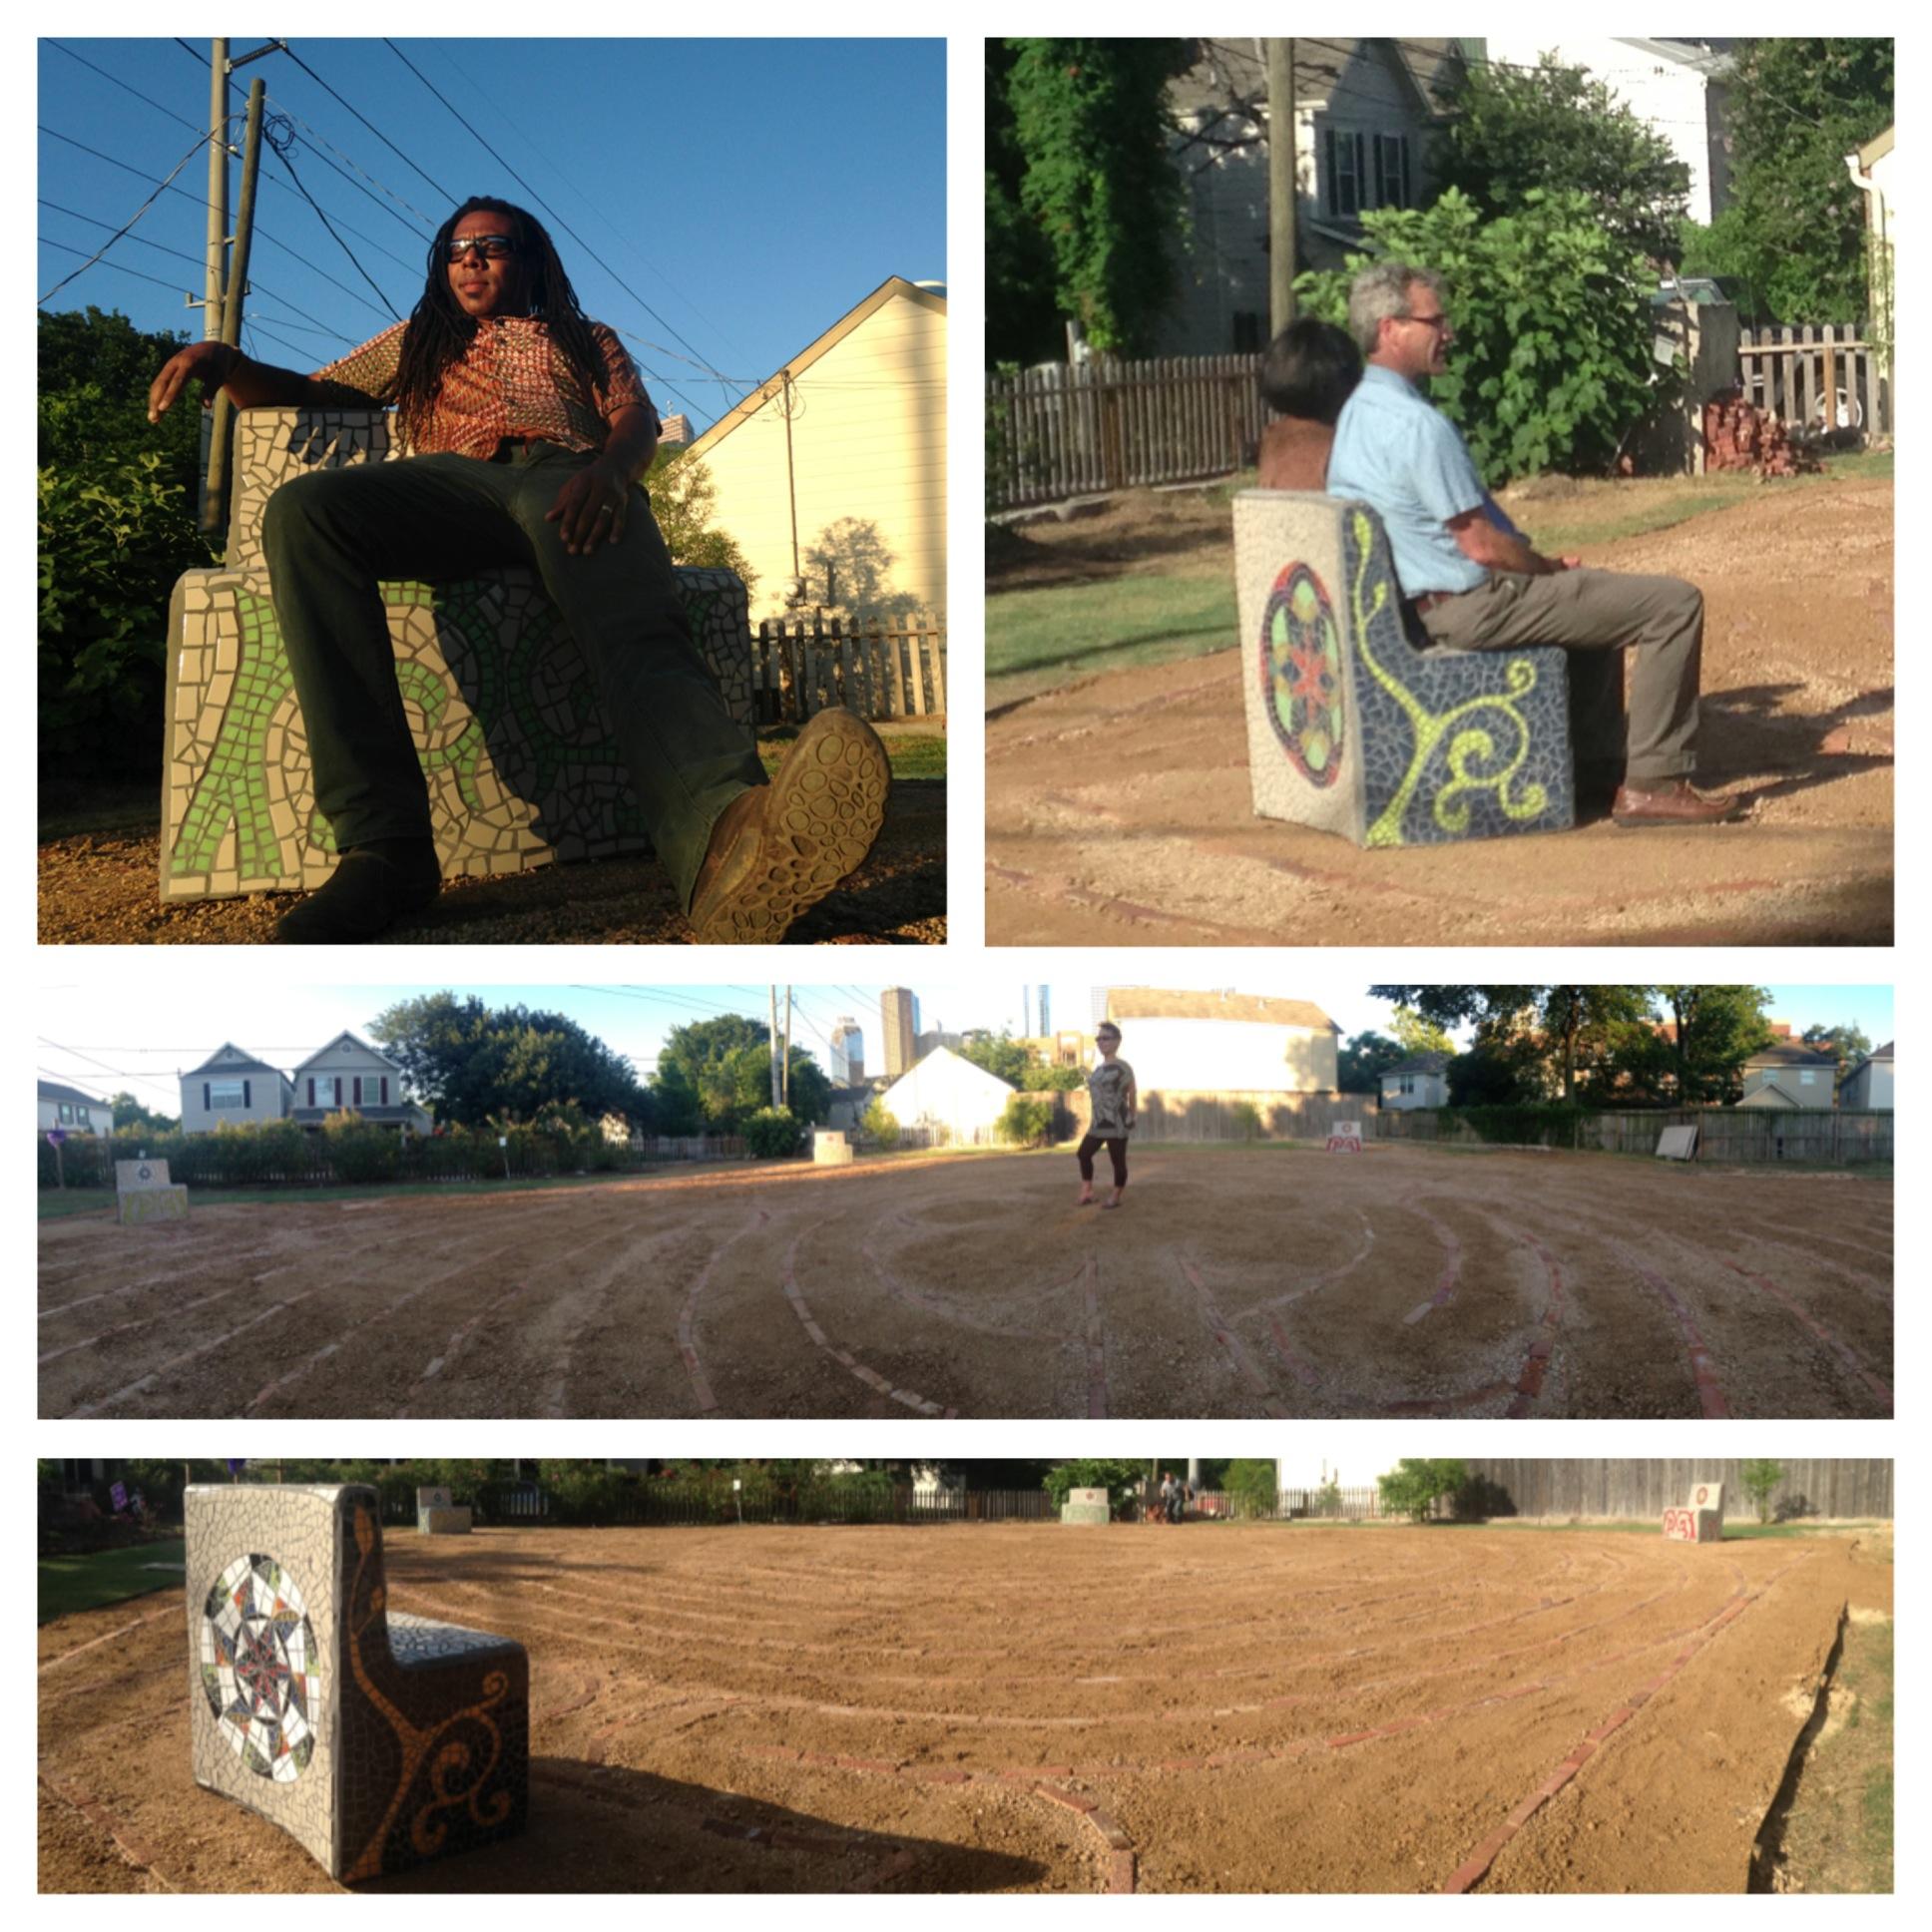 Historic Freedmen's Town Labyrinth